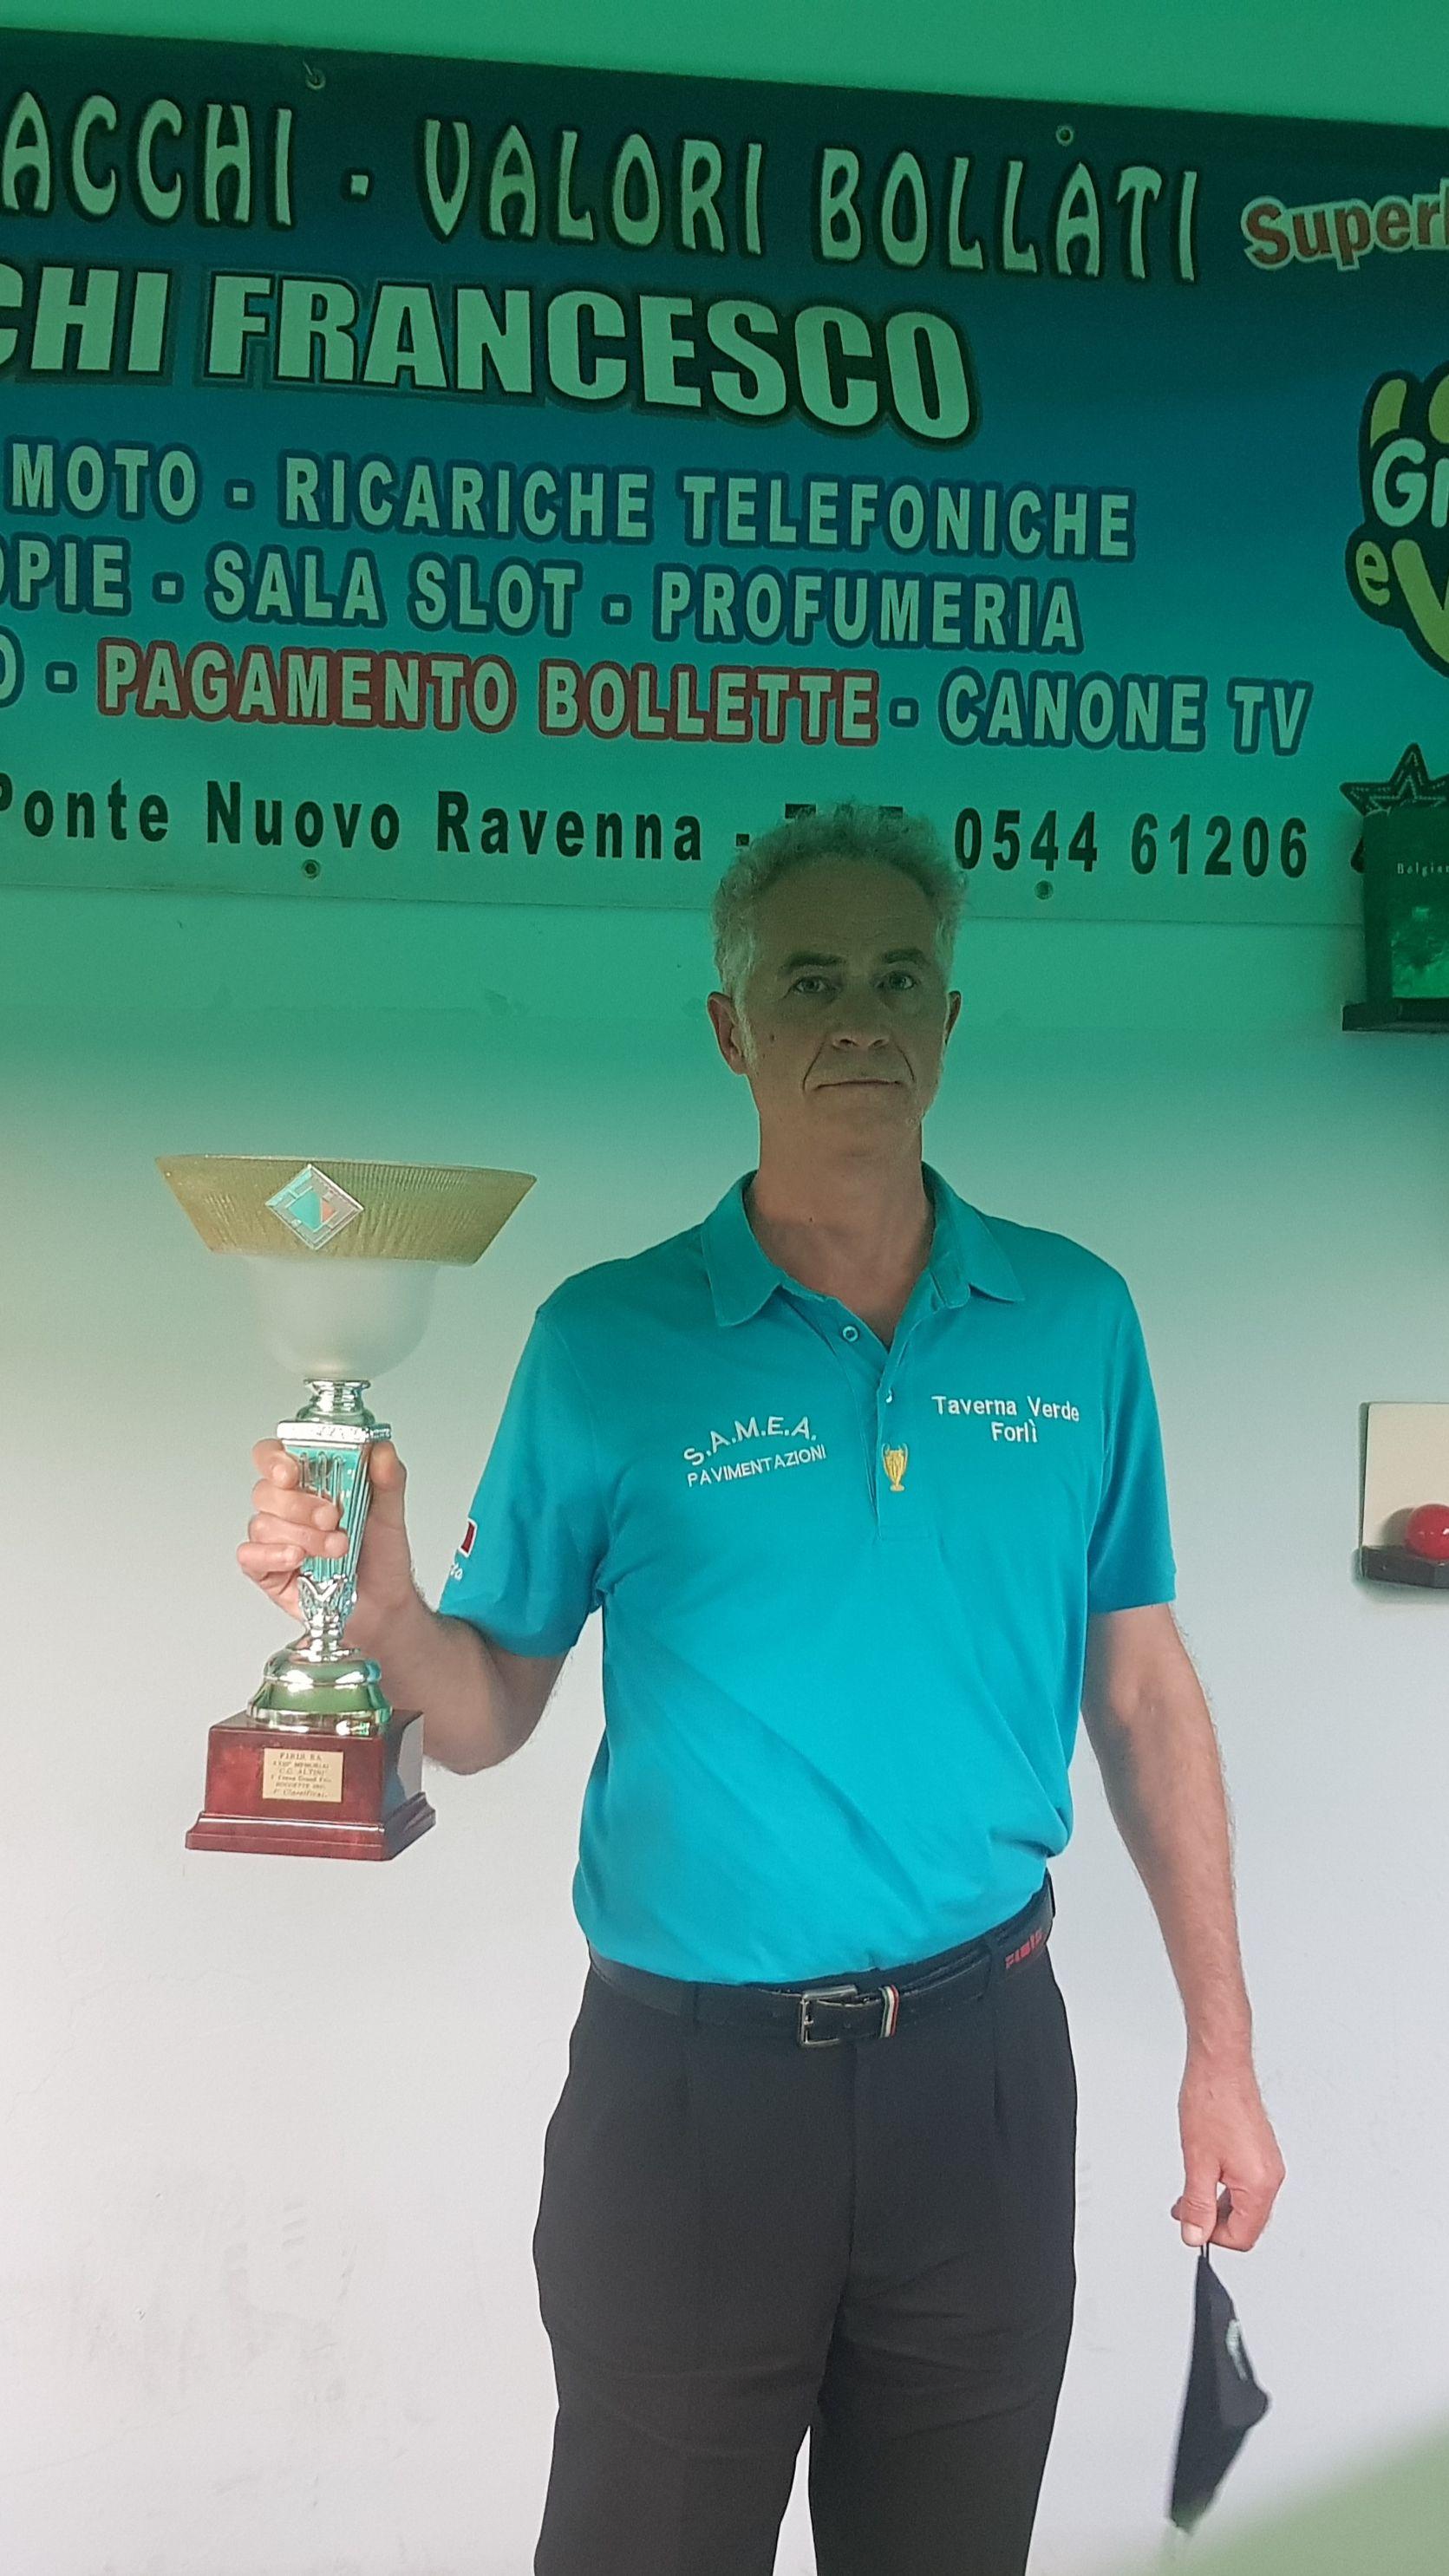 Angelo Corbetta